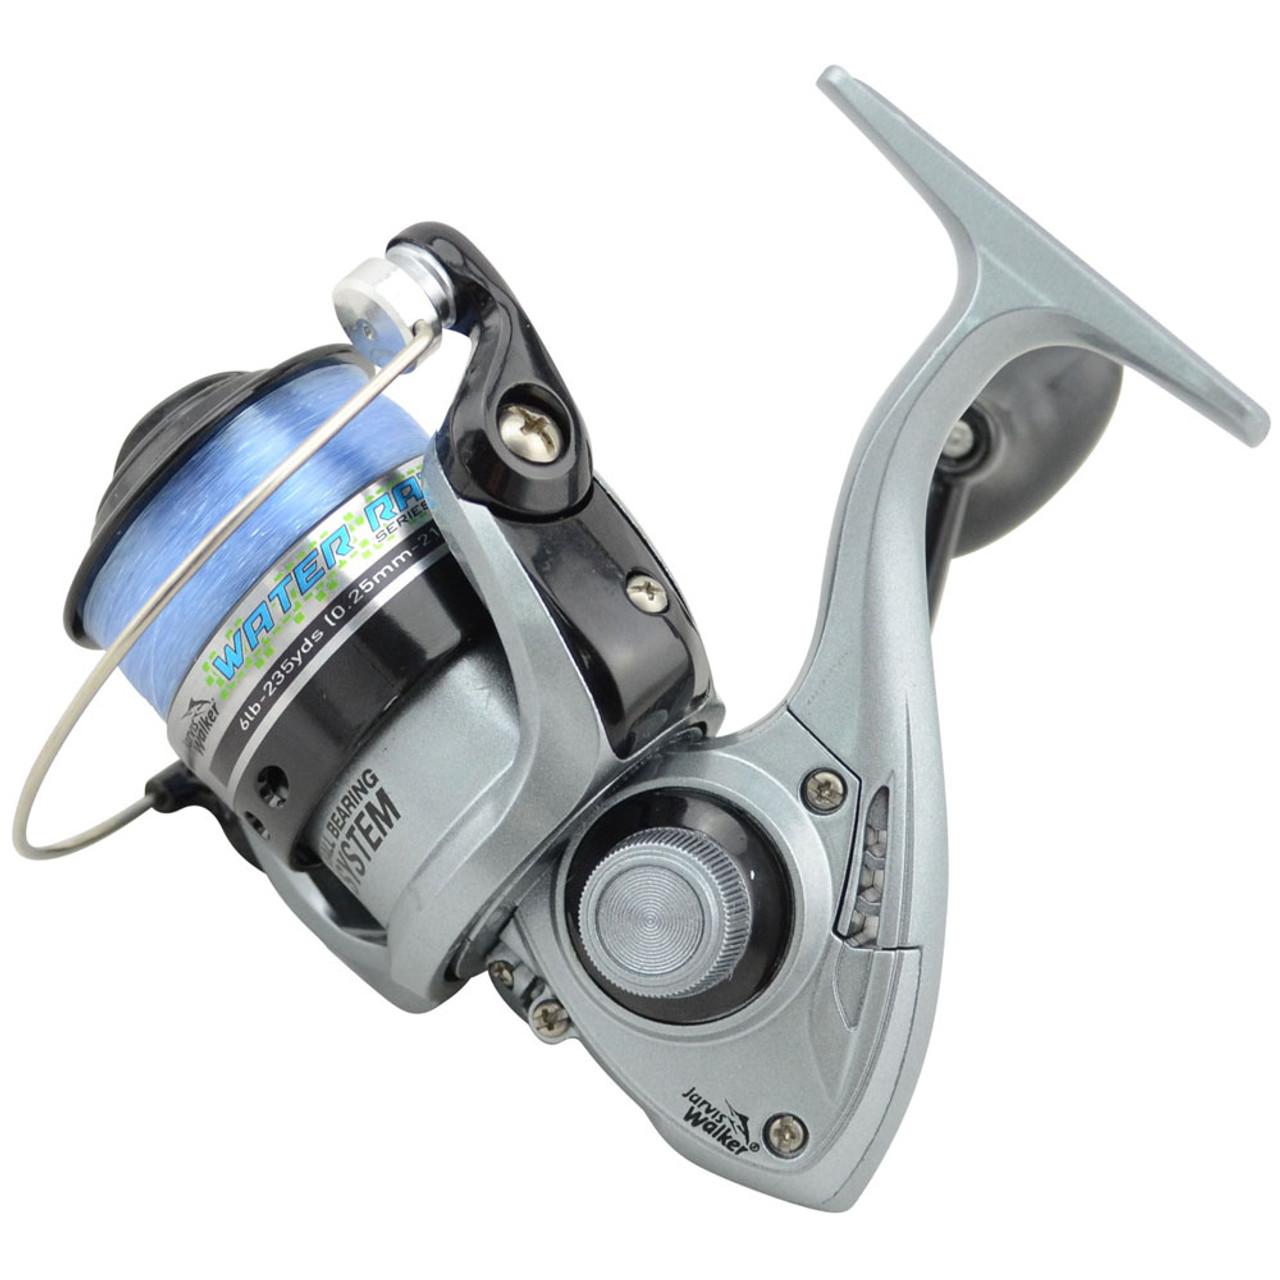 Jarvis Walker Water Rat 8/' Telescopic General Purpose Fishing Rod